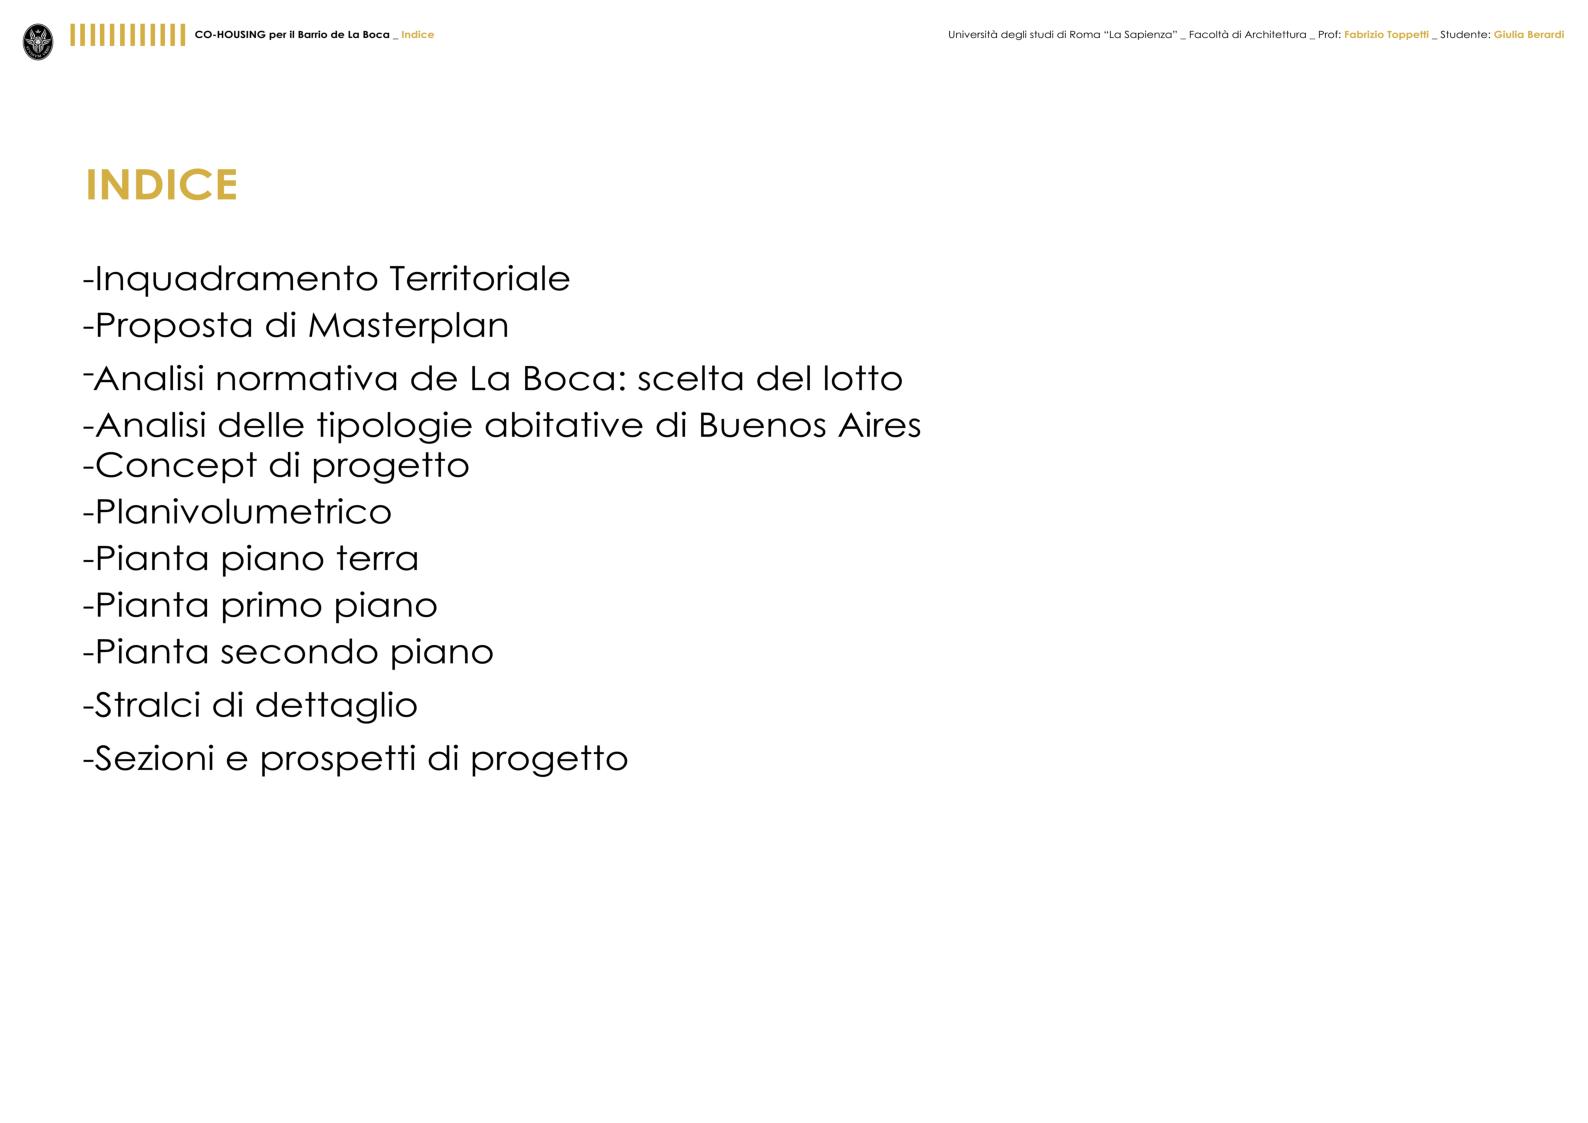 Indice della tesi: Cohousing per il barrio de La Boca - Buenos Aires, Pagina 1